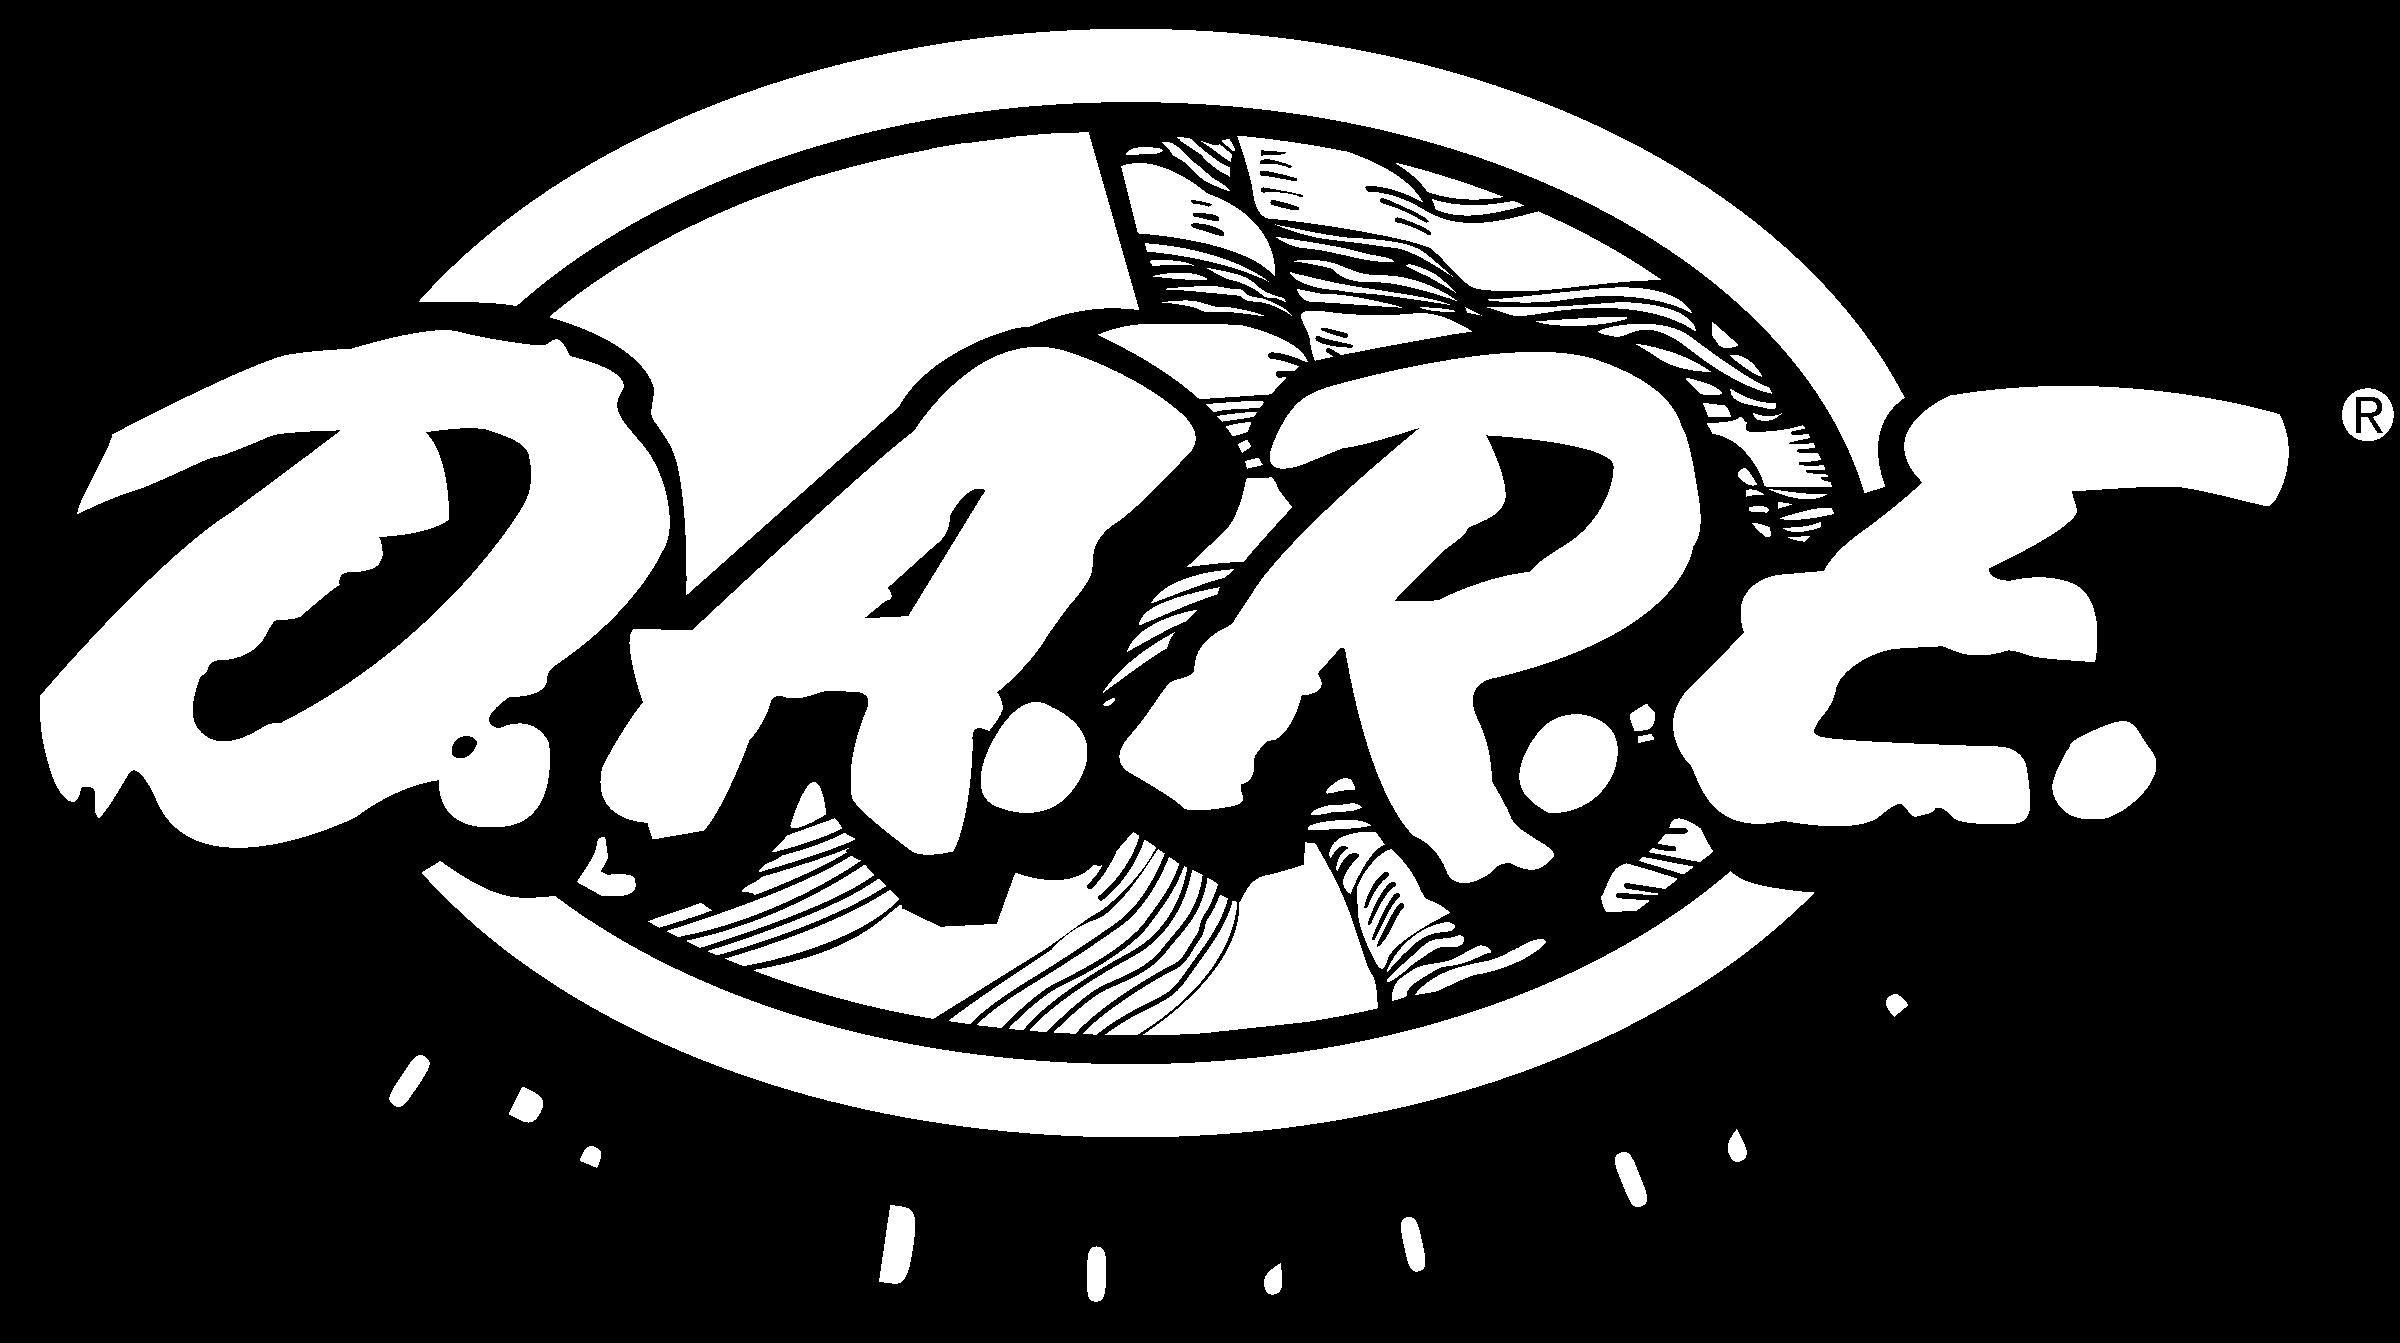 DARE new Logo PNG Transparent & SVG Vector.